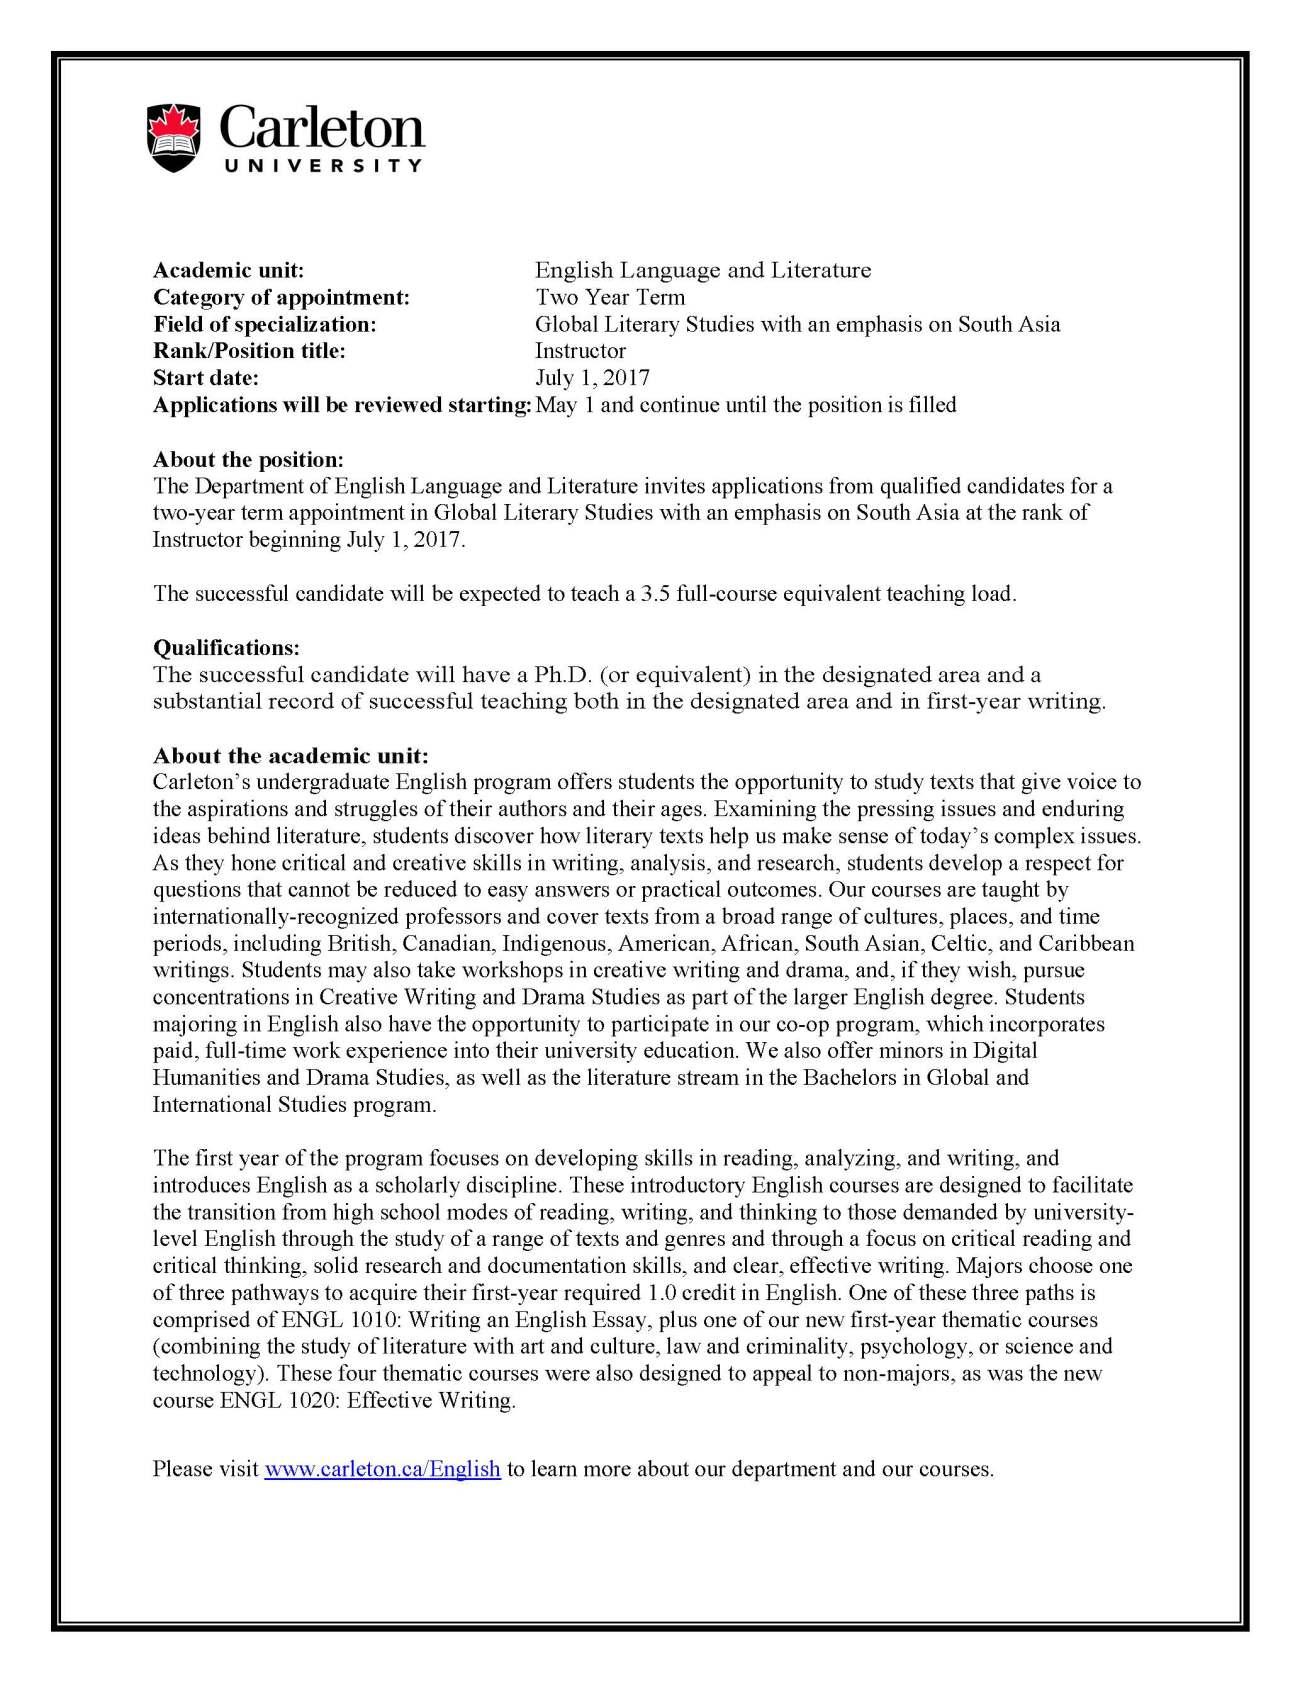 English-Language-and-Literature-Global-Literary-Studies-2-year-Term jpeg_Page_1.jpg